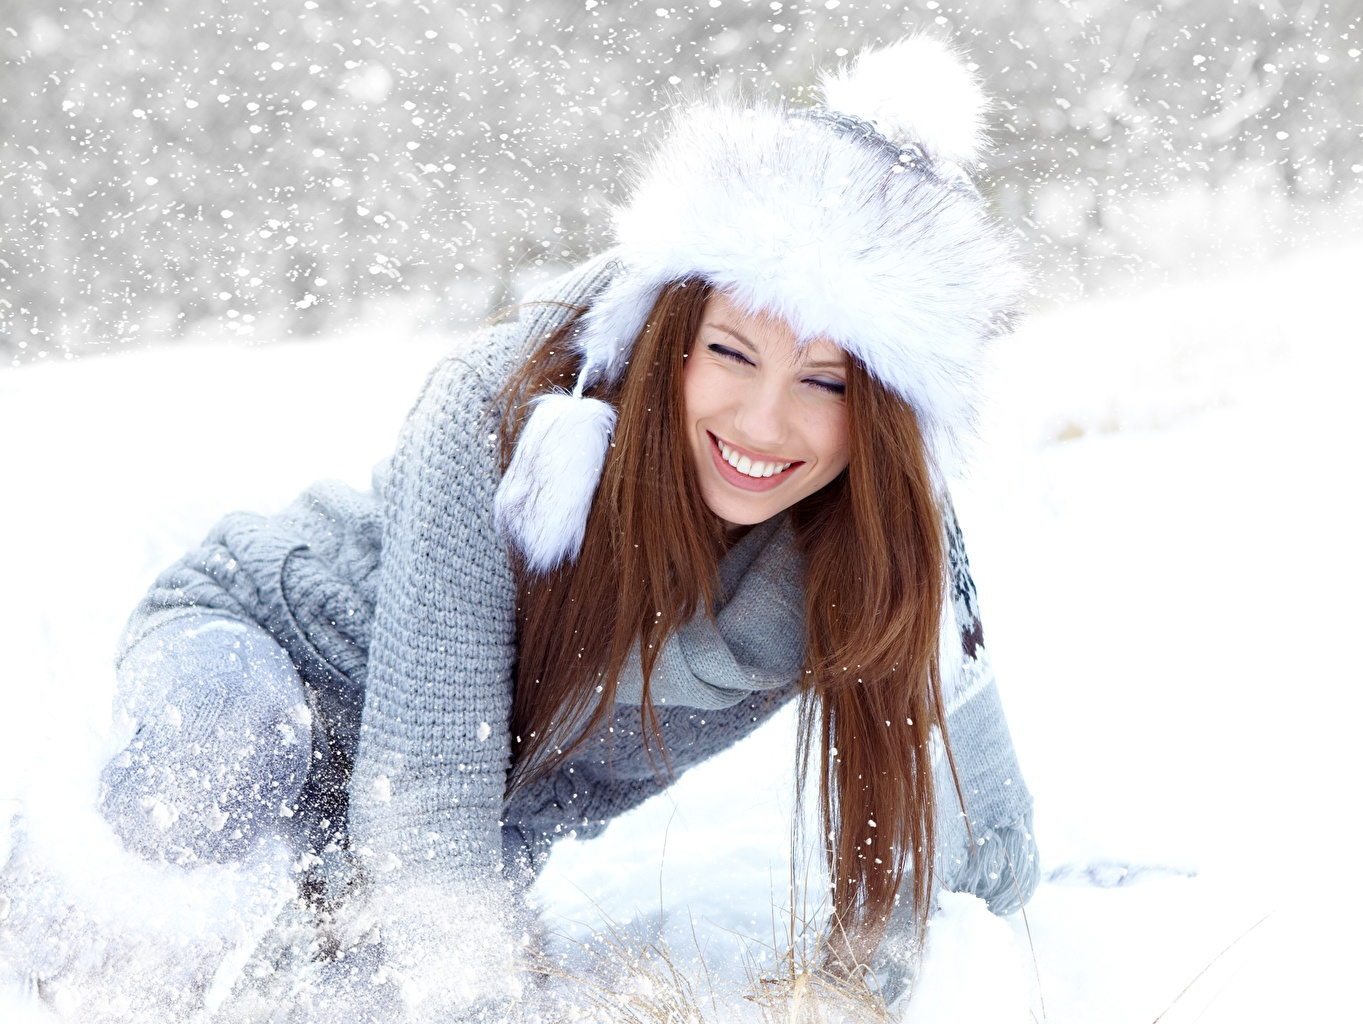 Картинки Izabela Magier Шатенка Улыбка Зима шапка Девушки снеге Свитер шатенки улыбается Шапки зимние в шапке девушка молодая женщина молодые женщины Снег снега снегу свитере свитера